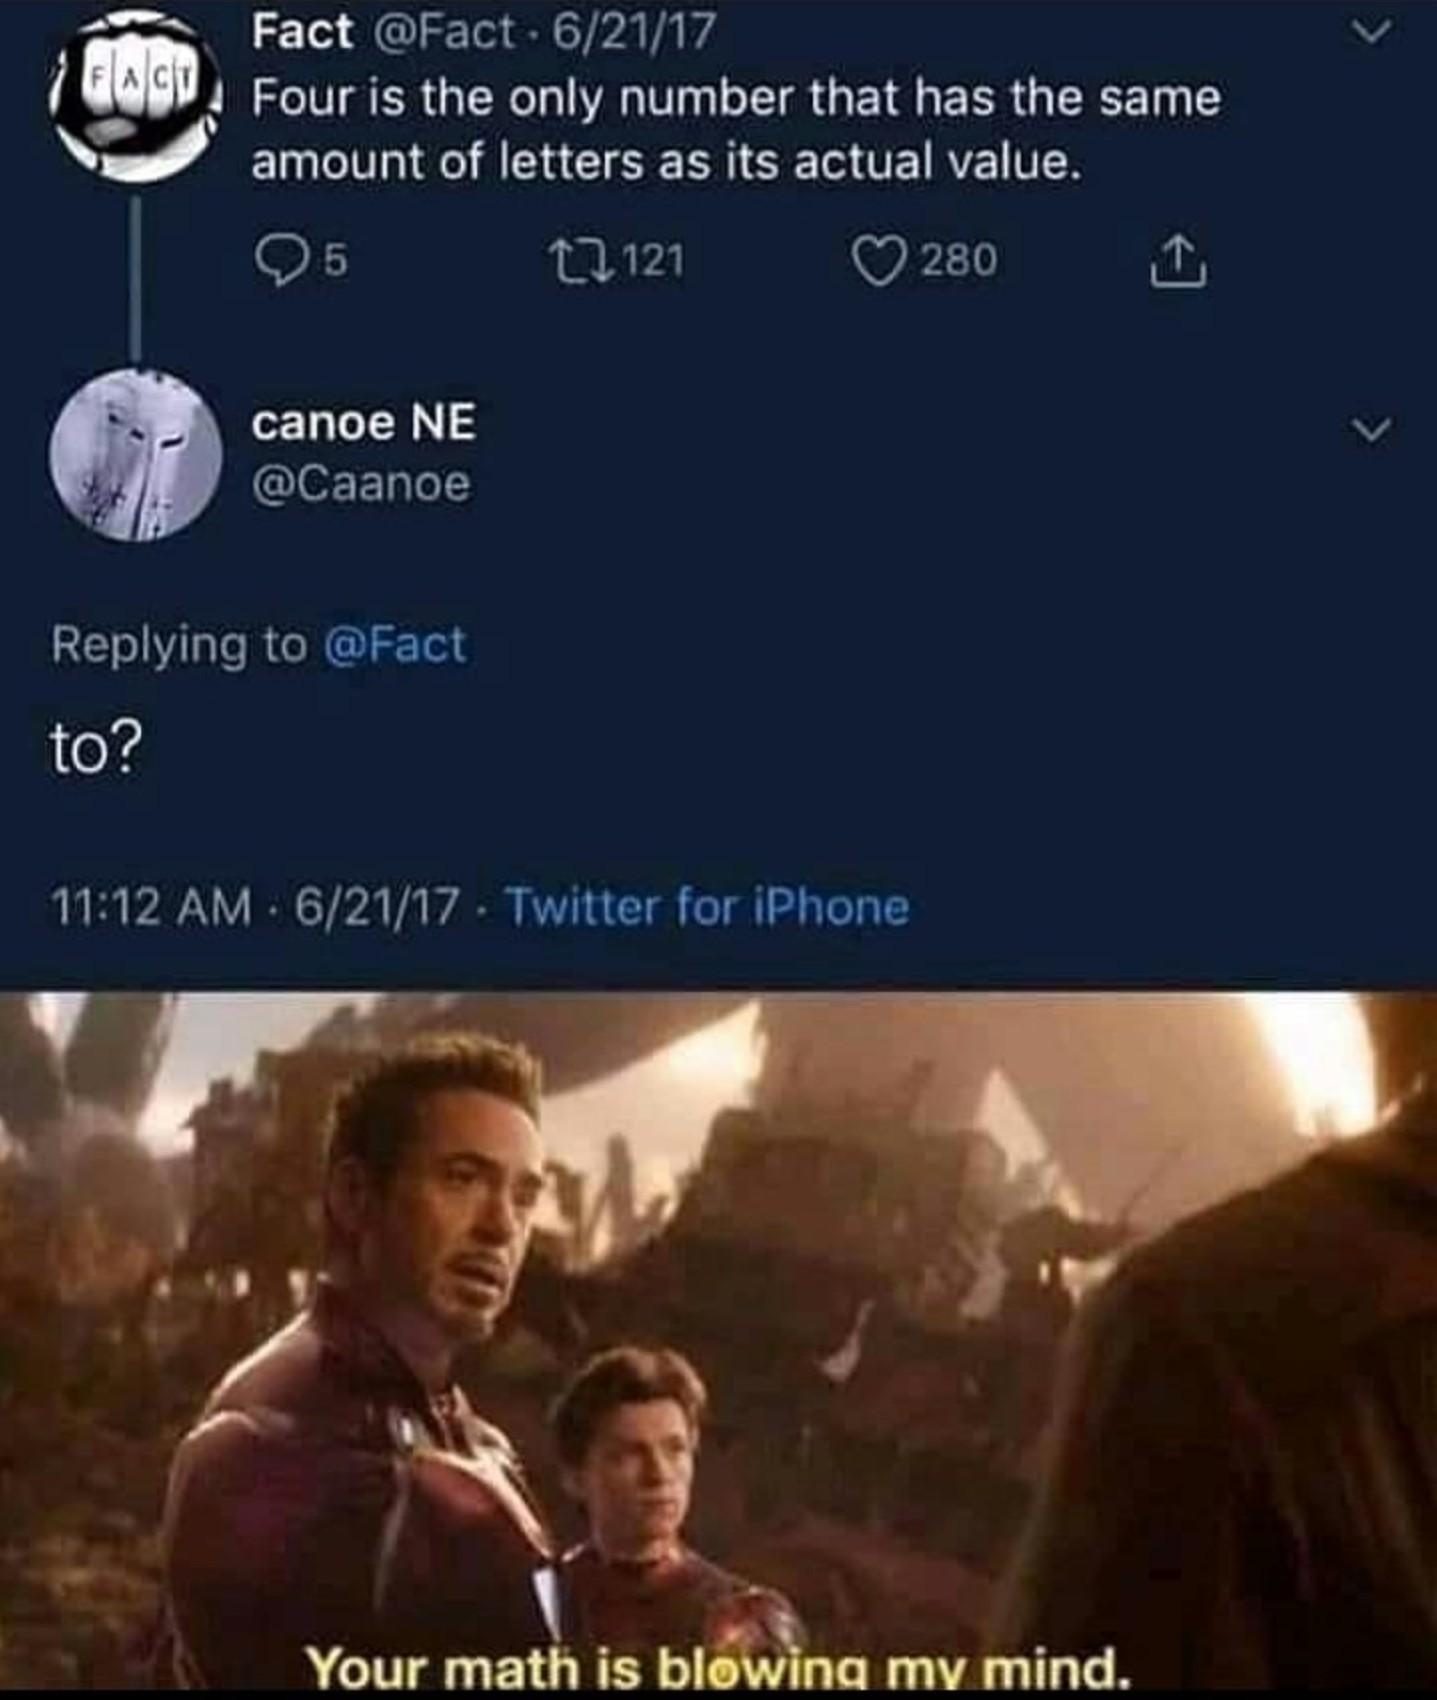 To? - meme